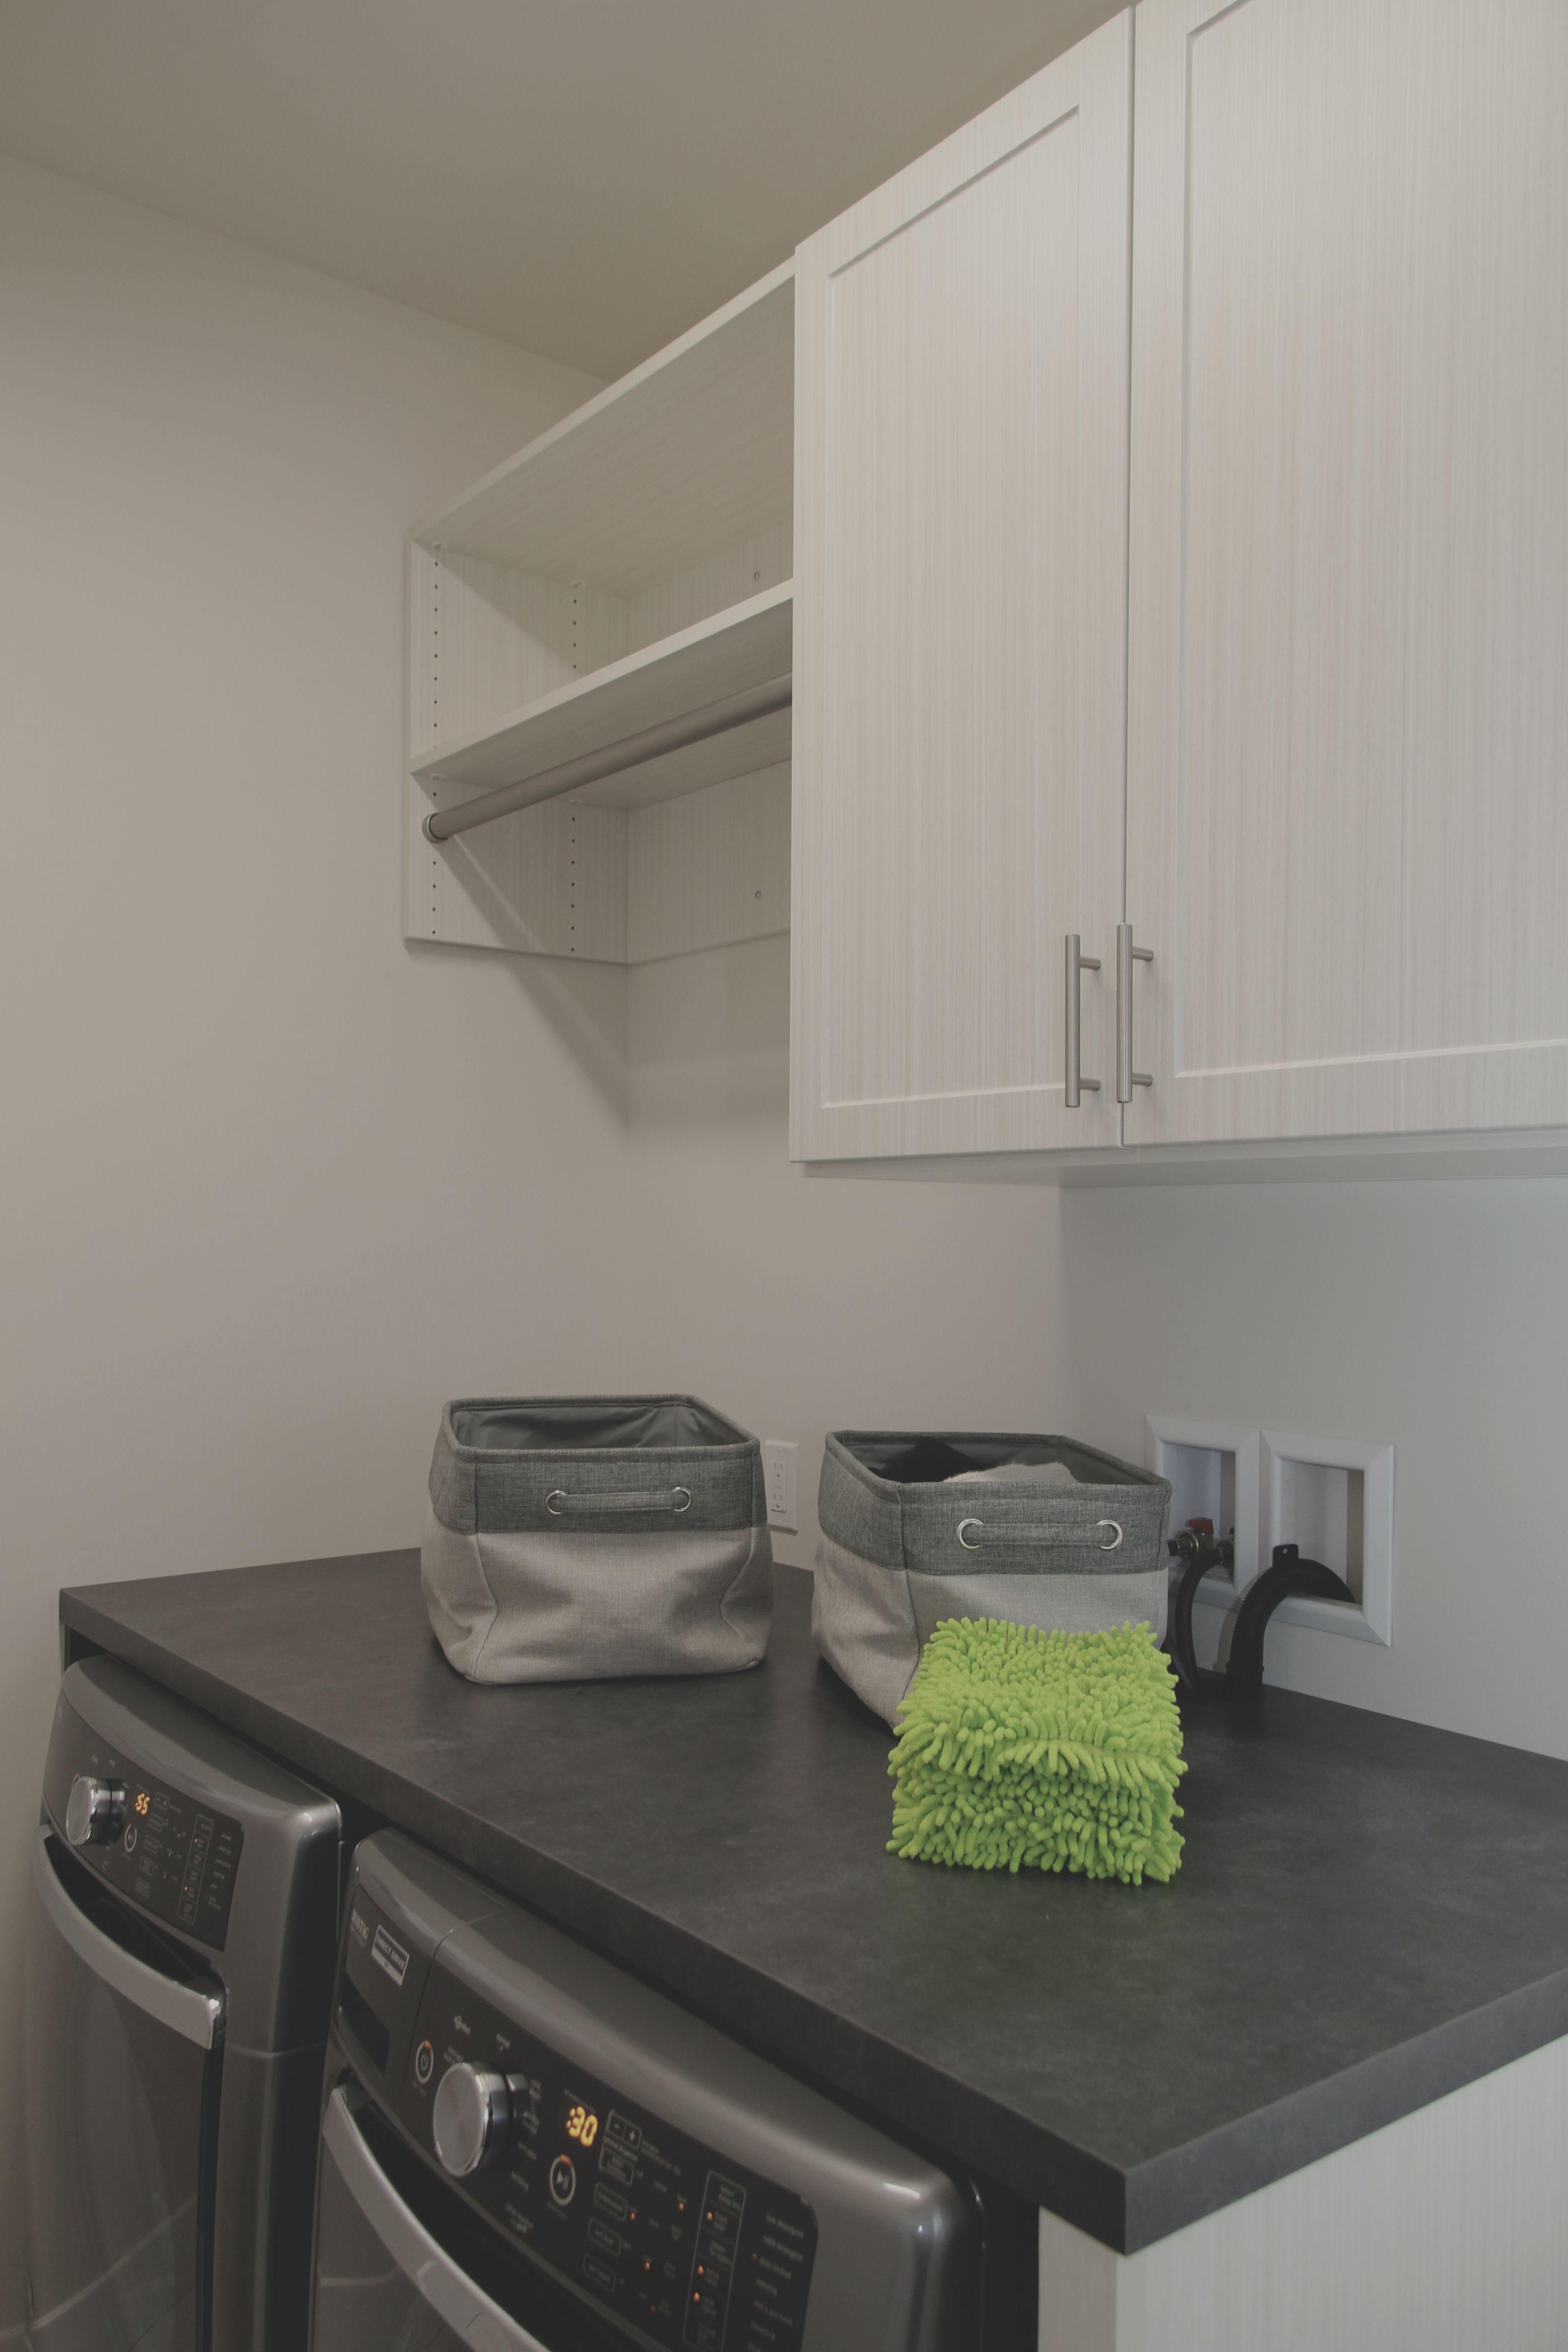 Laundry Room Organization Storage Solutions Creative Closets Storage Solutions